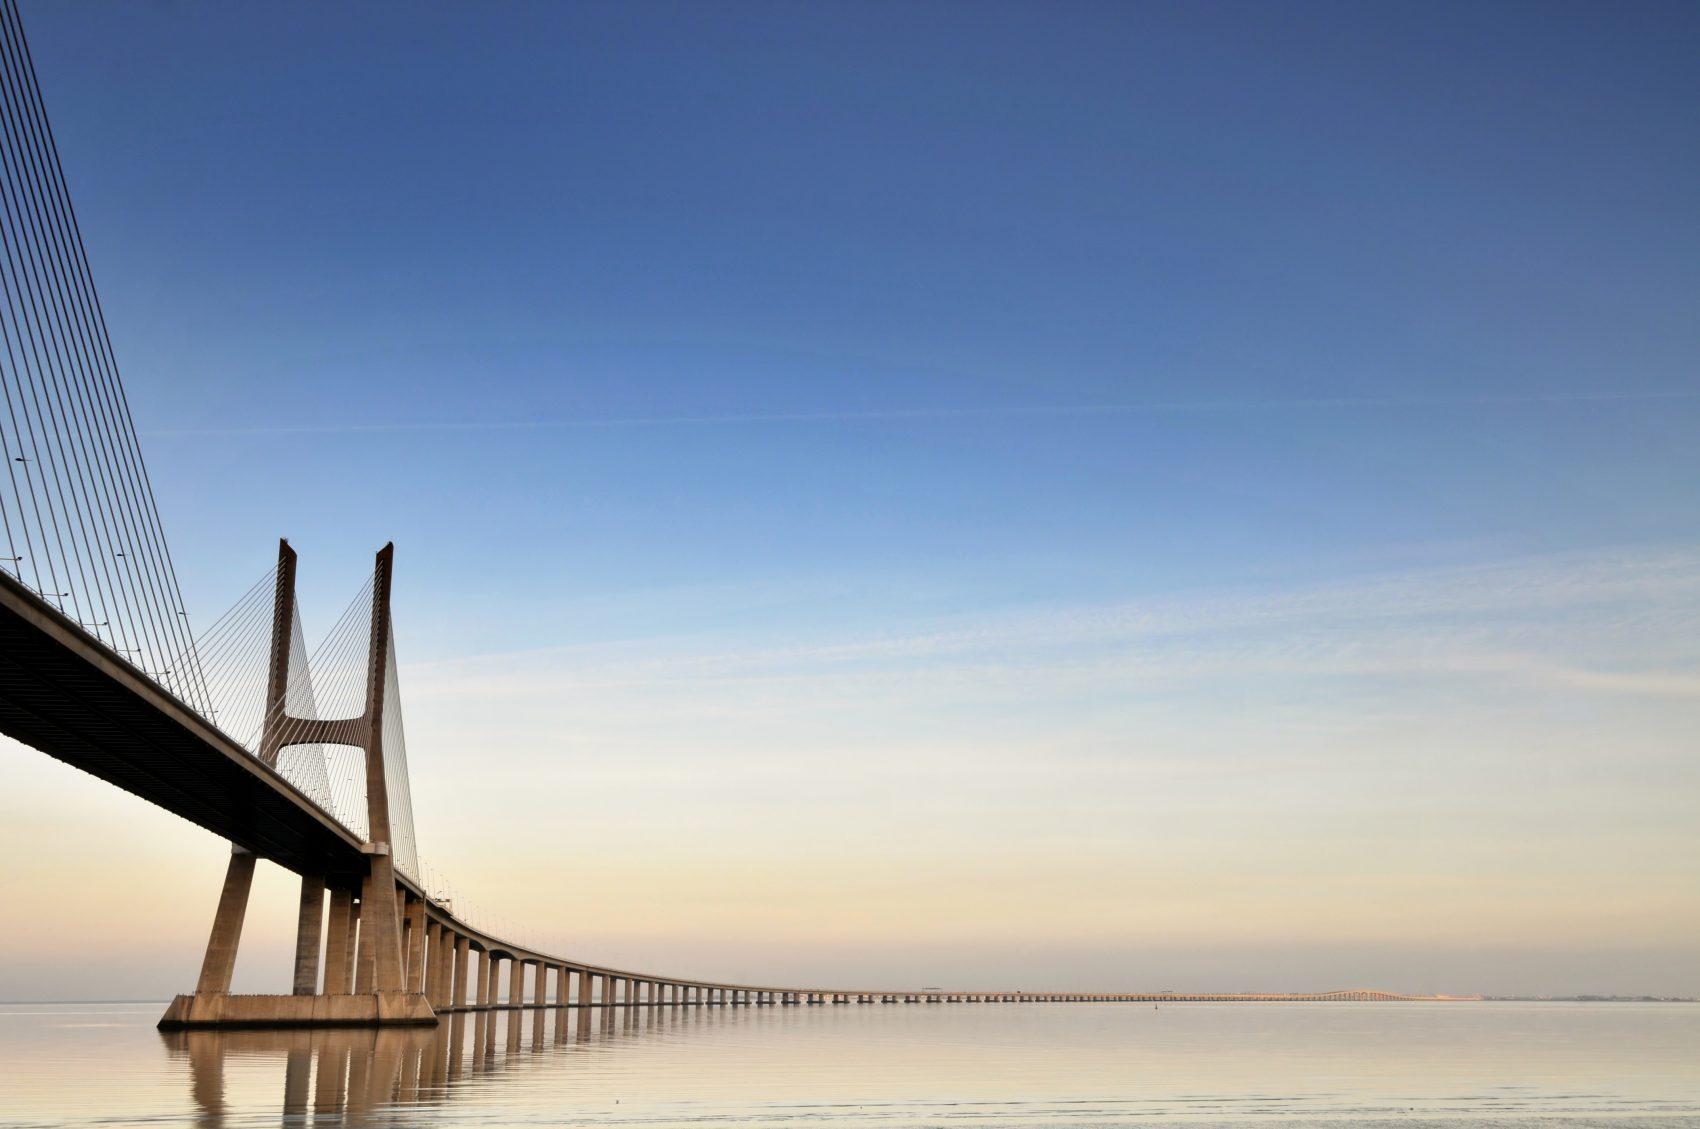 Longest bridge in Europe, Portugal